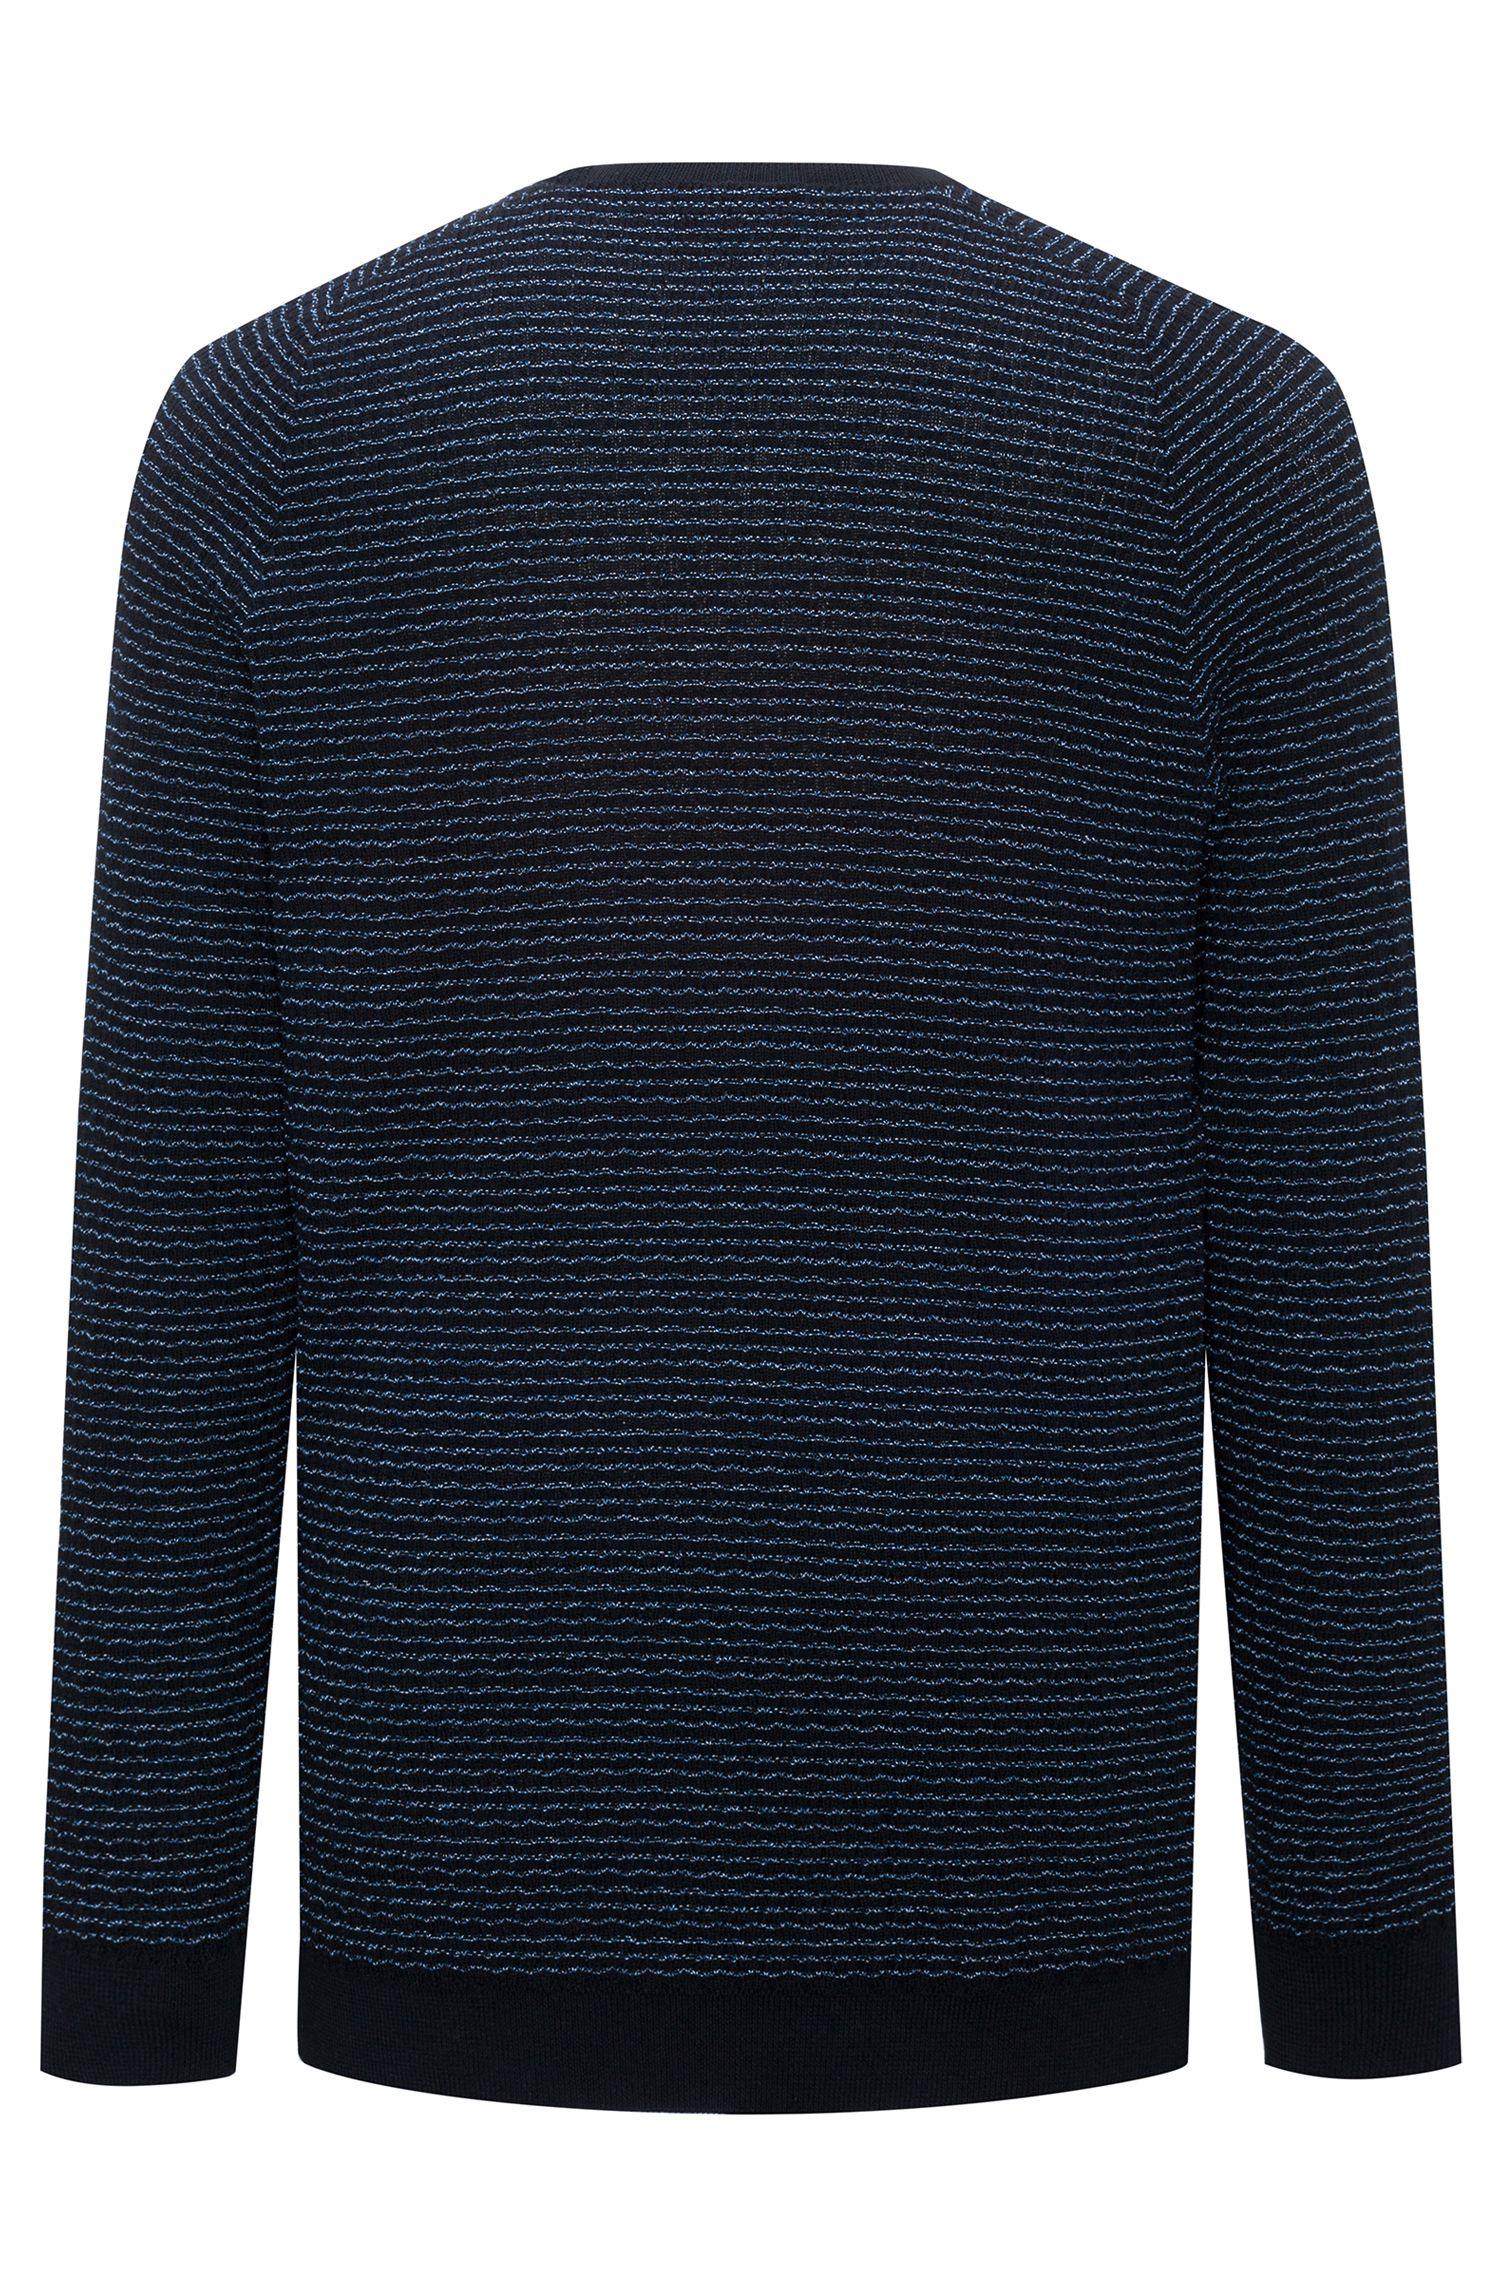 Cotton sweater with seersucker texture